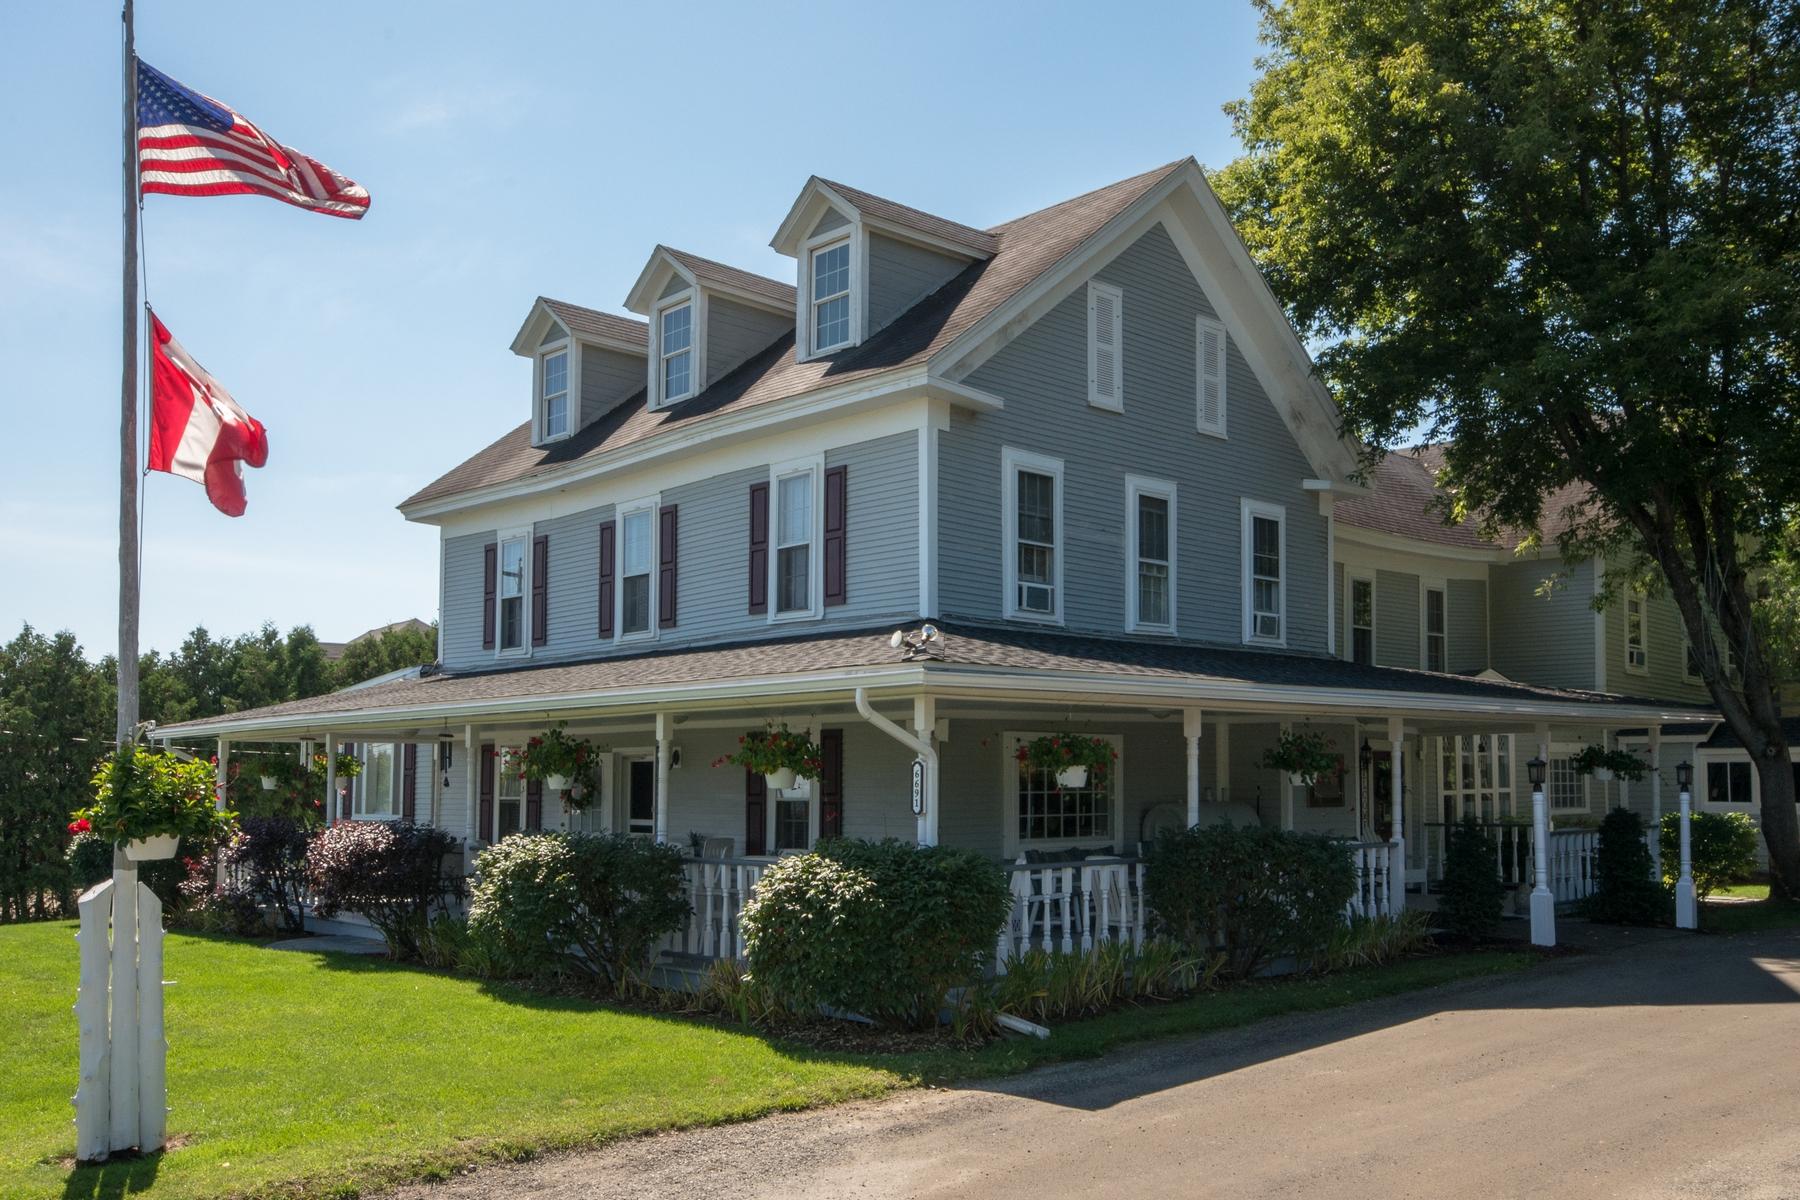 其它住宅 为 销售 在 The Westport Hotel & Tavern 6691 Main St Westport, 纽约州 12993 美国